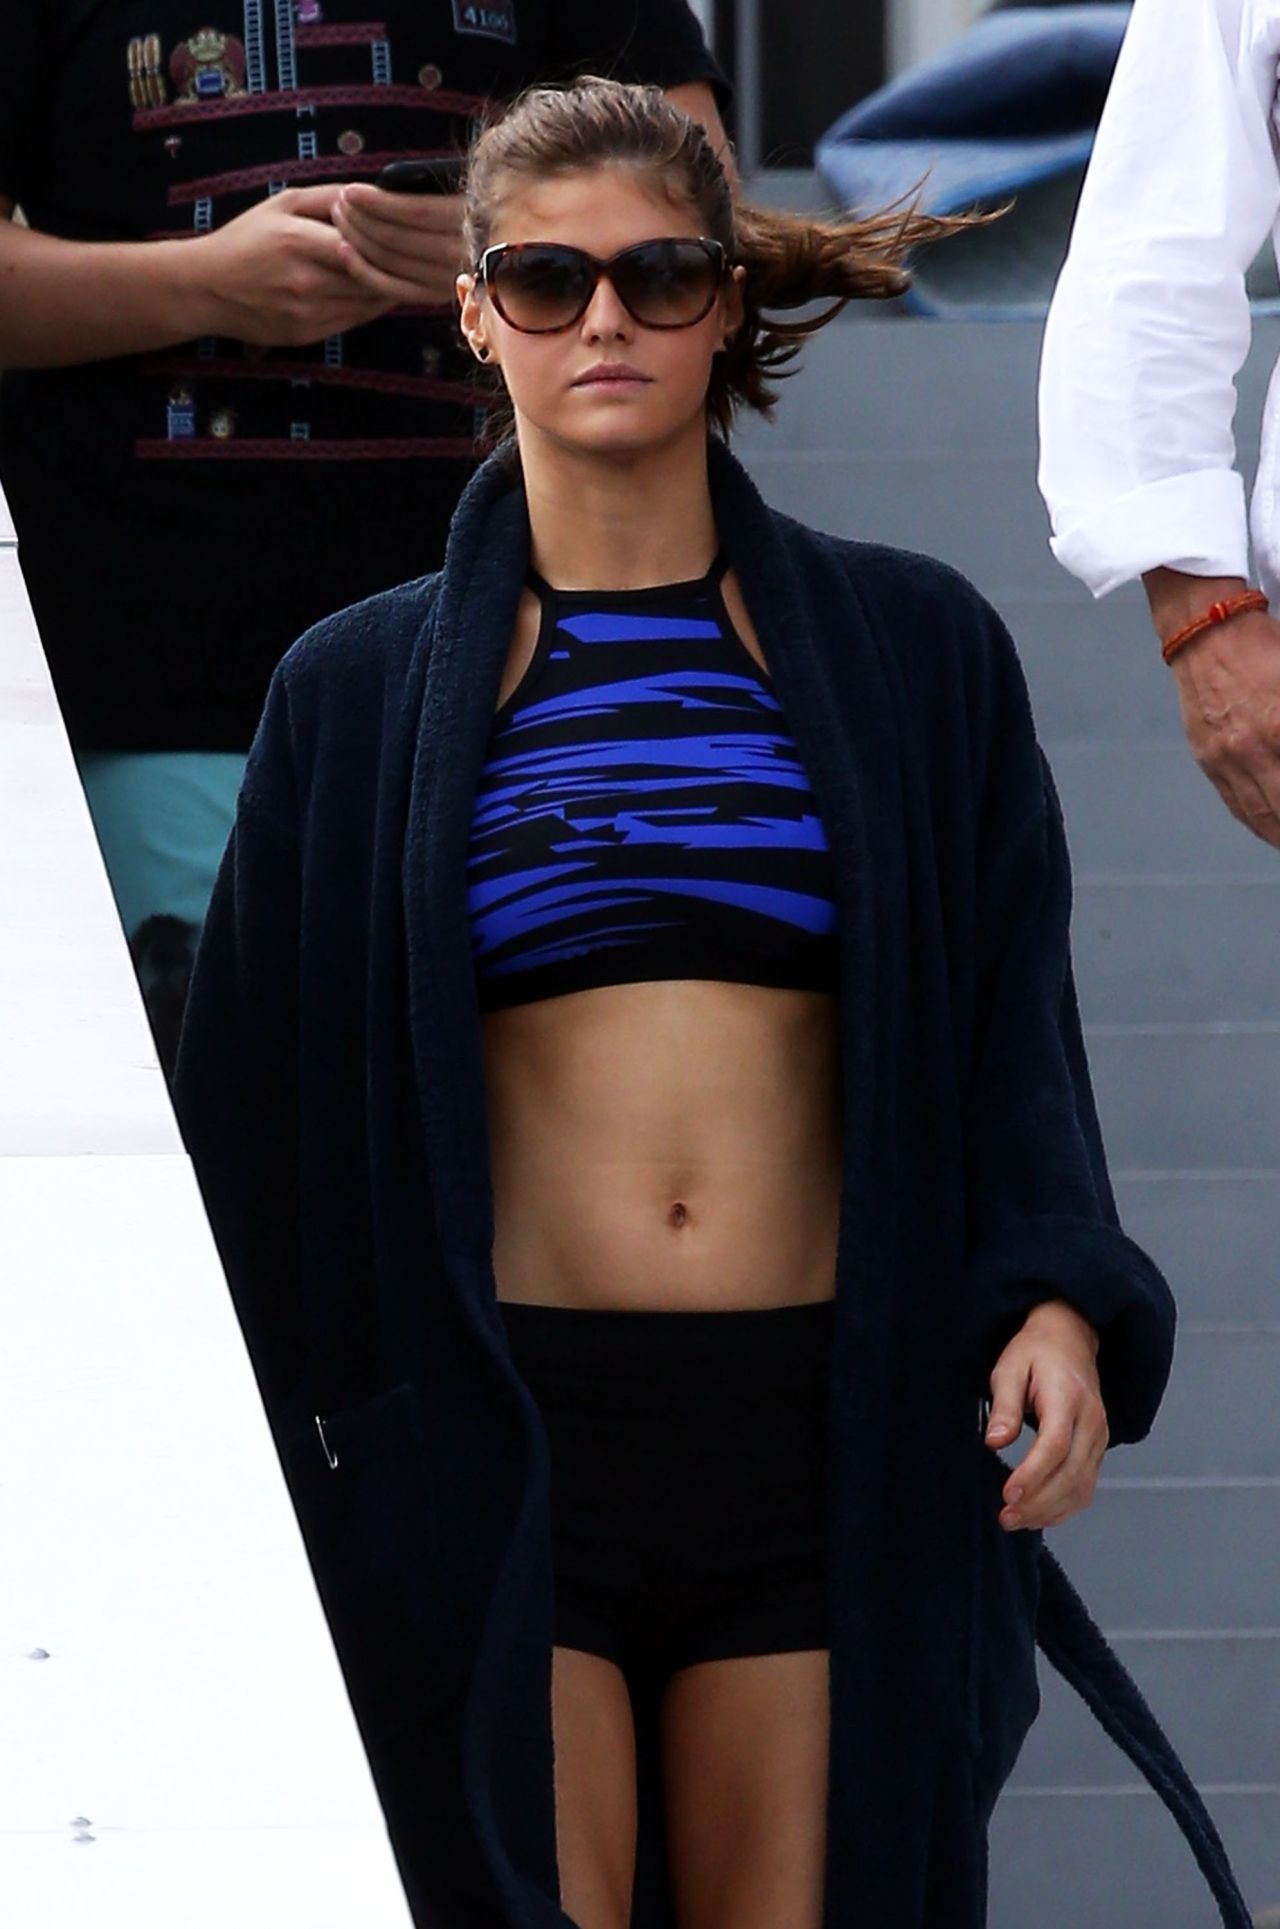 Alexandra daddario san andreas bikini - 1 7